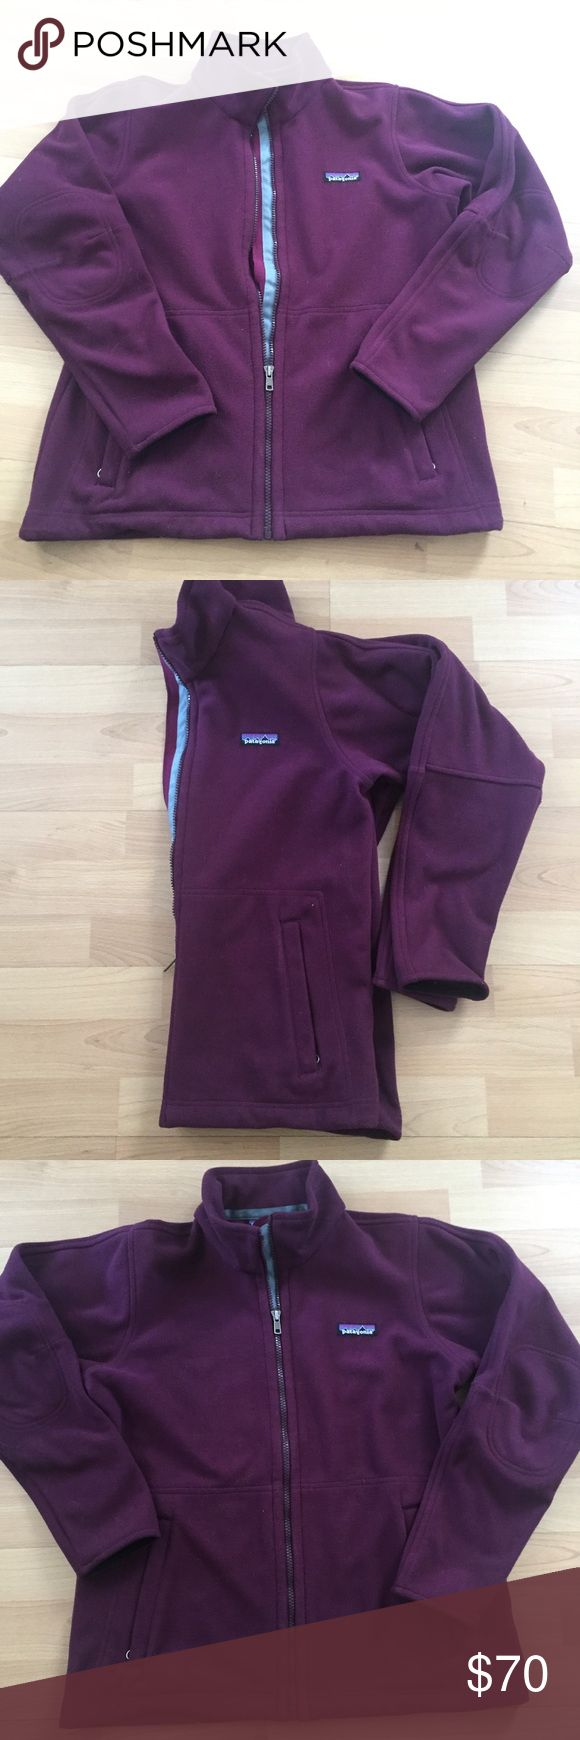 Patagonia Synchilla Women's coat Dark plum color Patagonia Synchilla jacket. Fleece jacket preowned in great shape. Patagonia Jackets & Coats